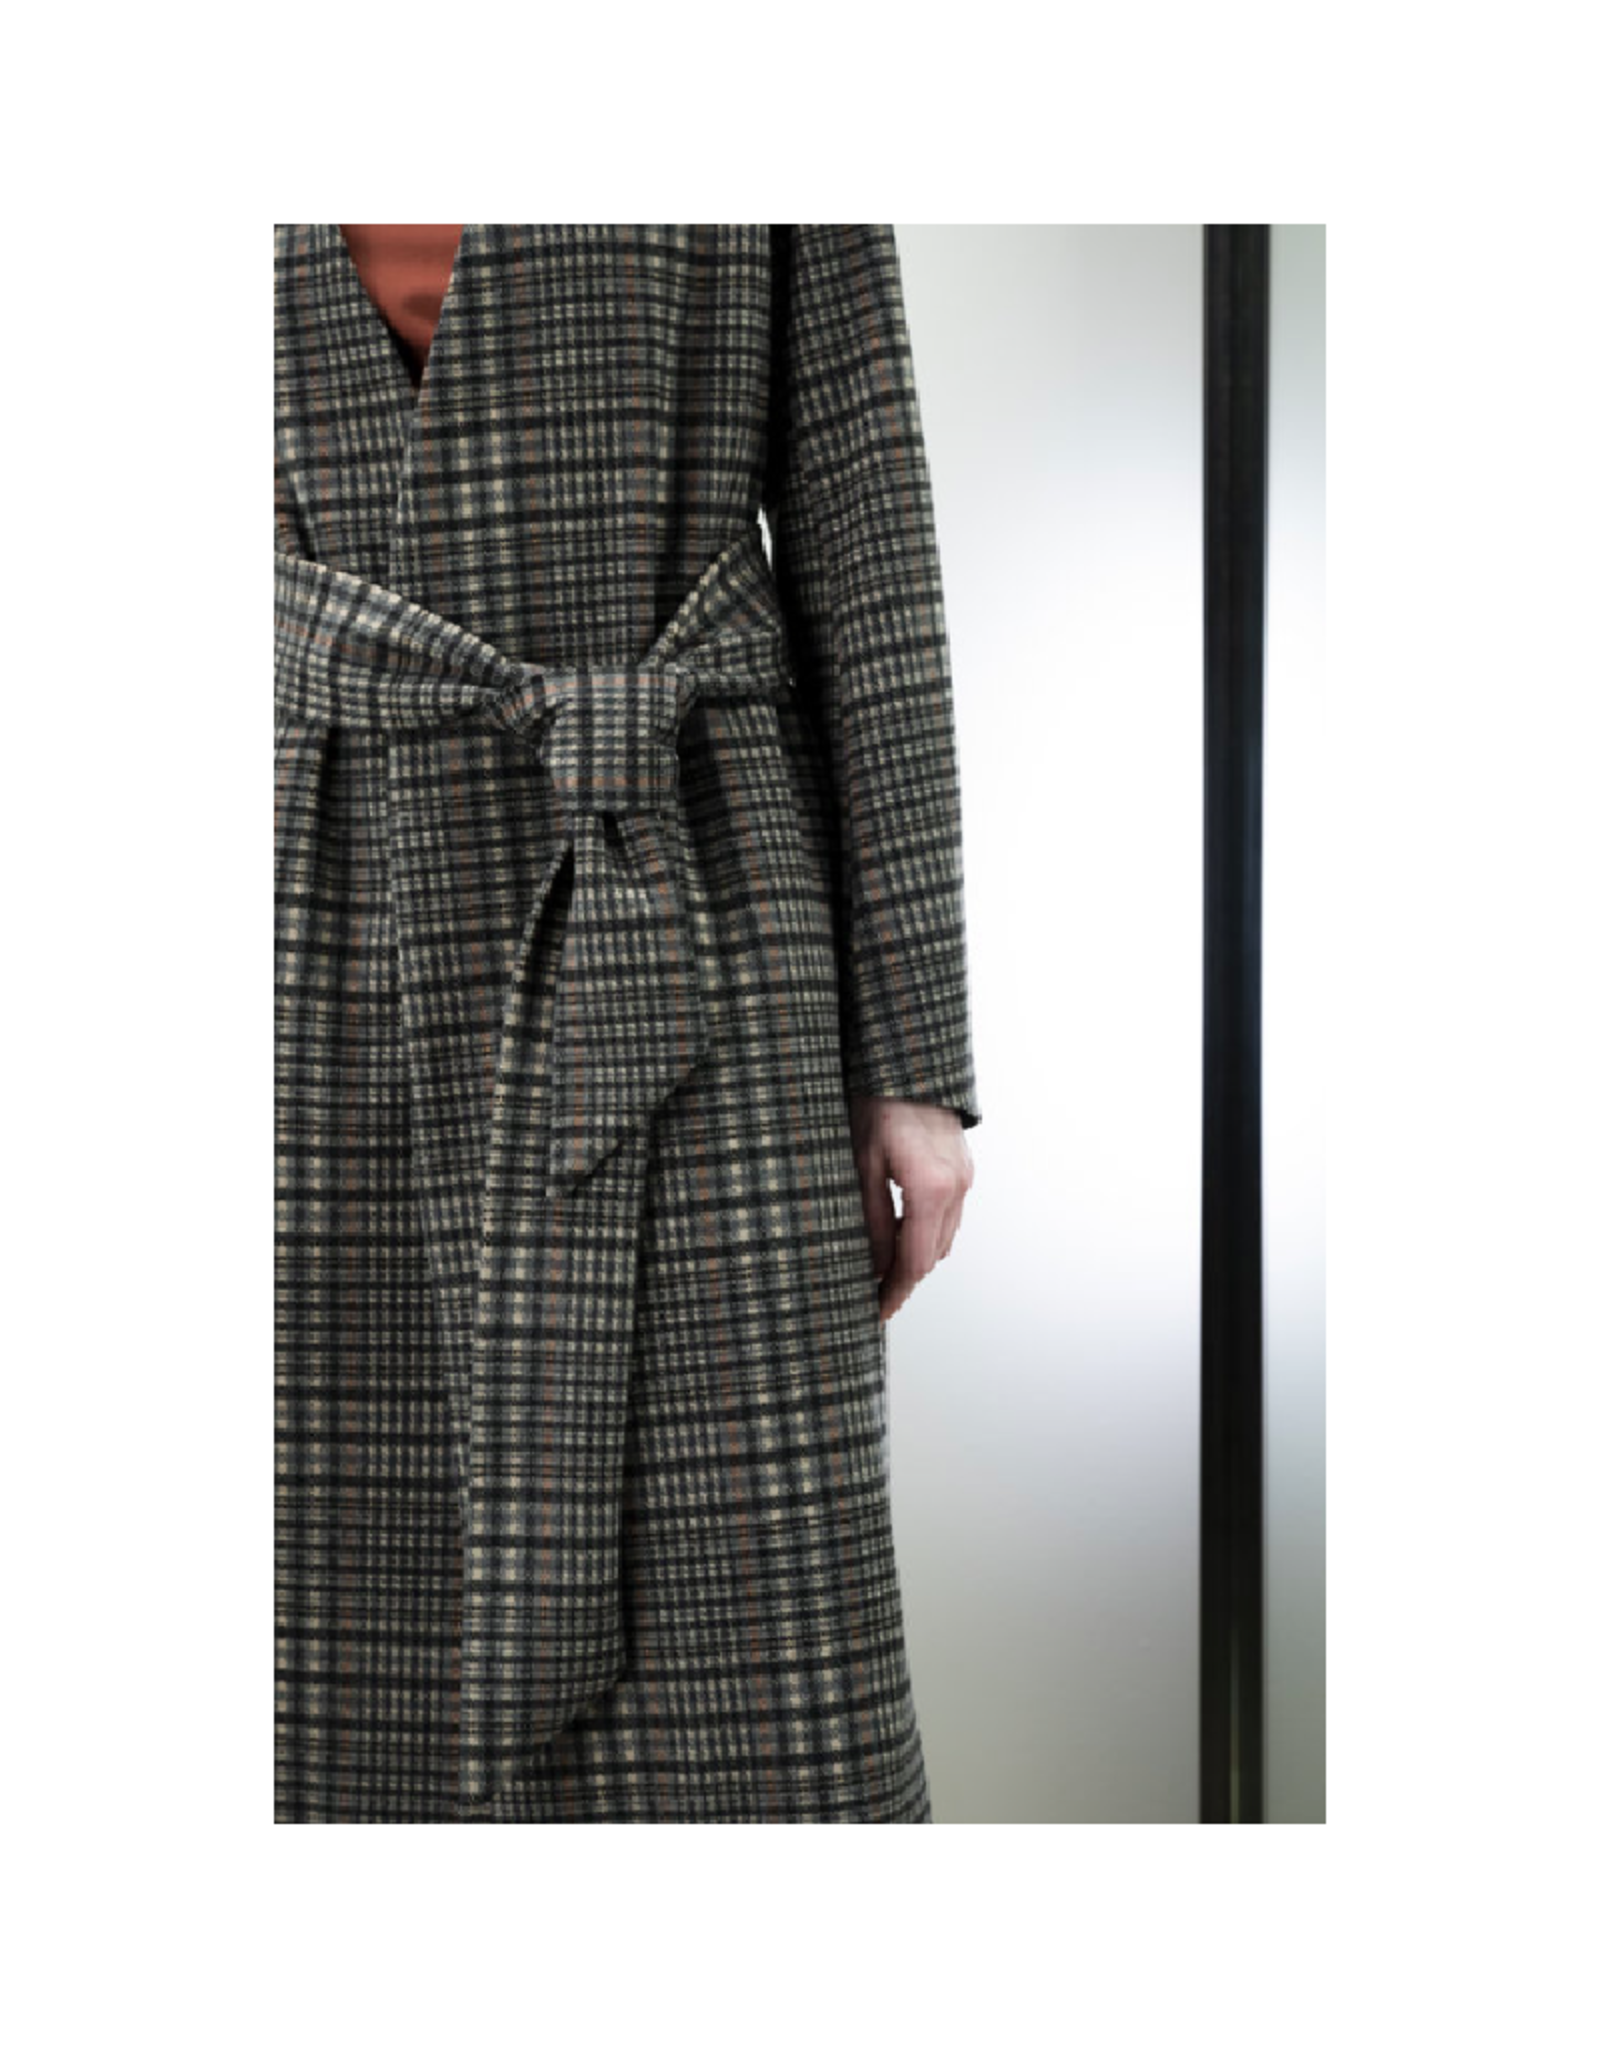 Bodybag Harbor Long Velour Jacket